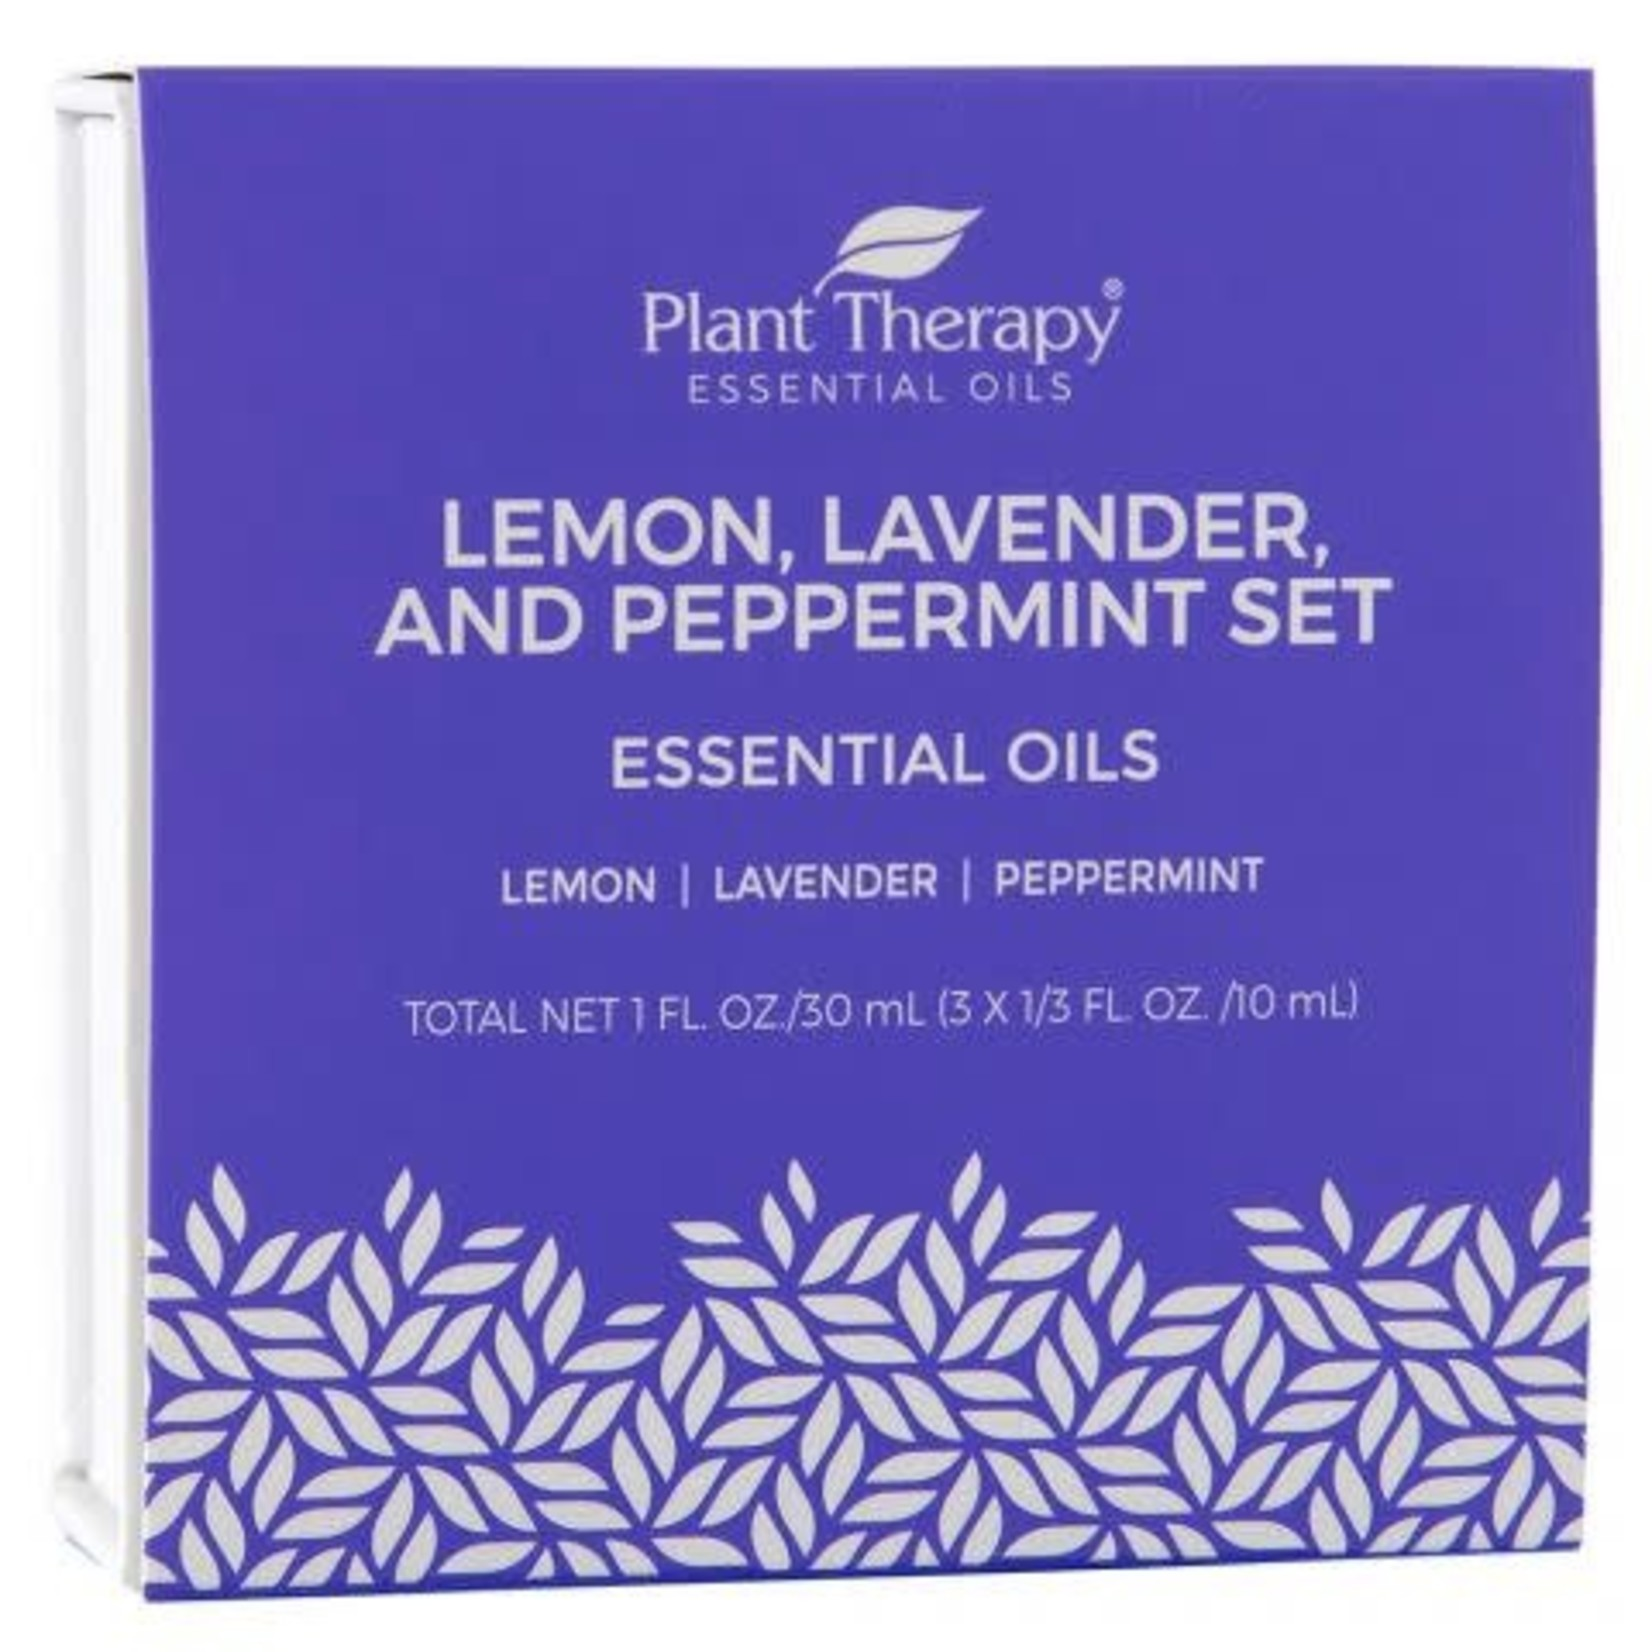 Plant Therapy PT Lemon, Lavender and Peppermint Set